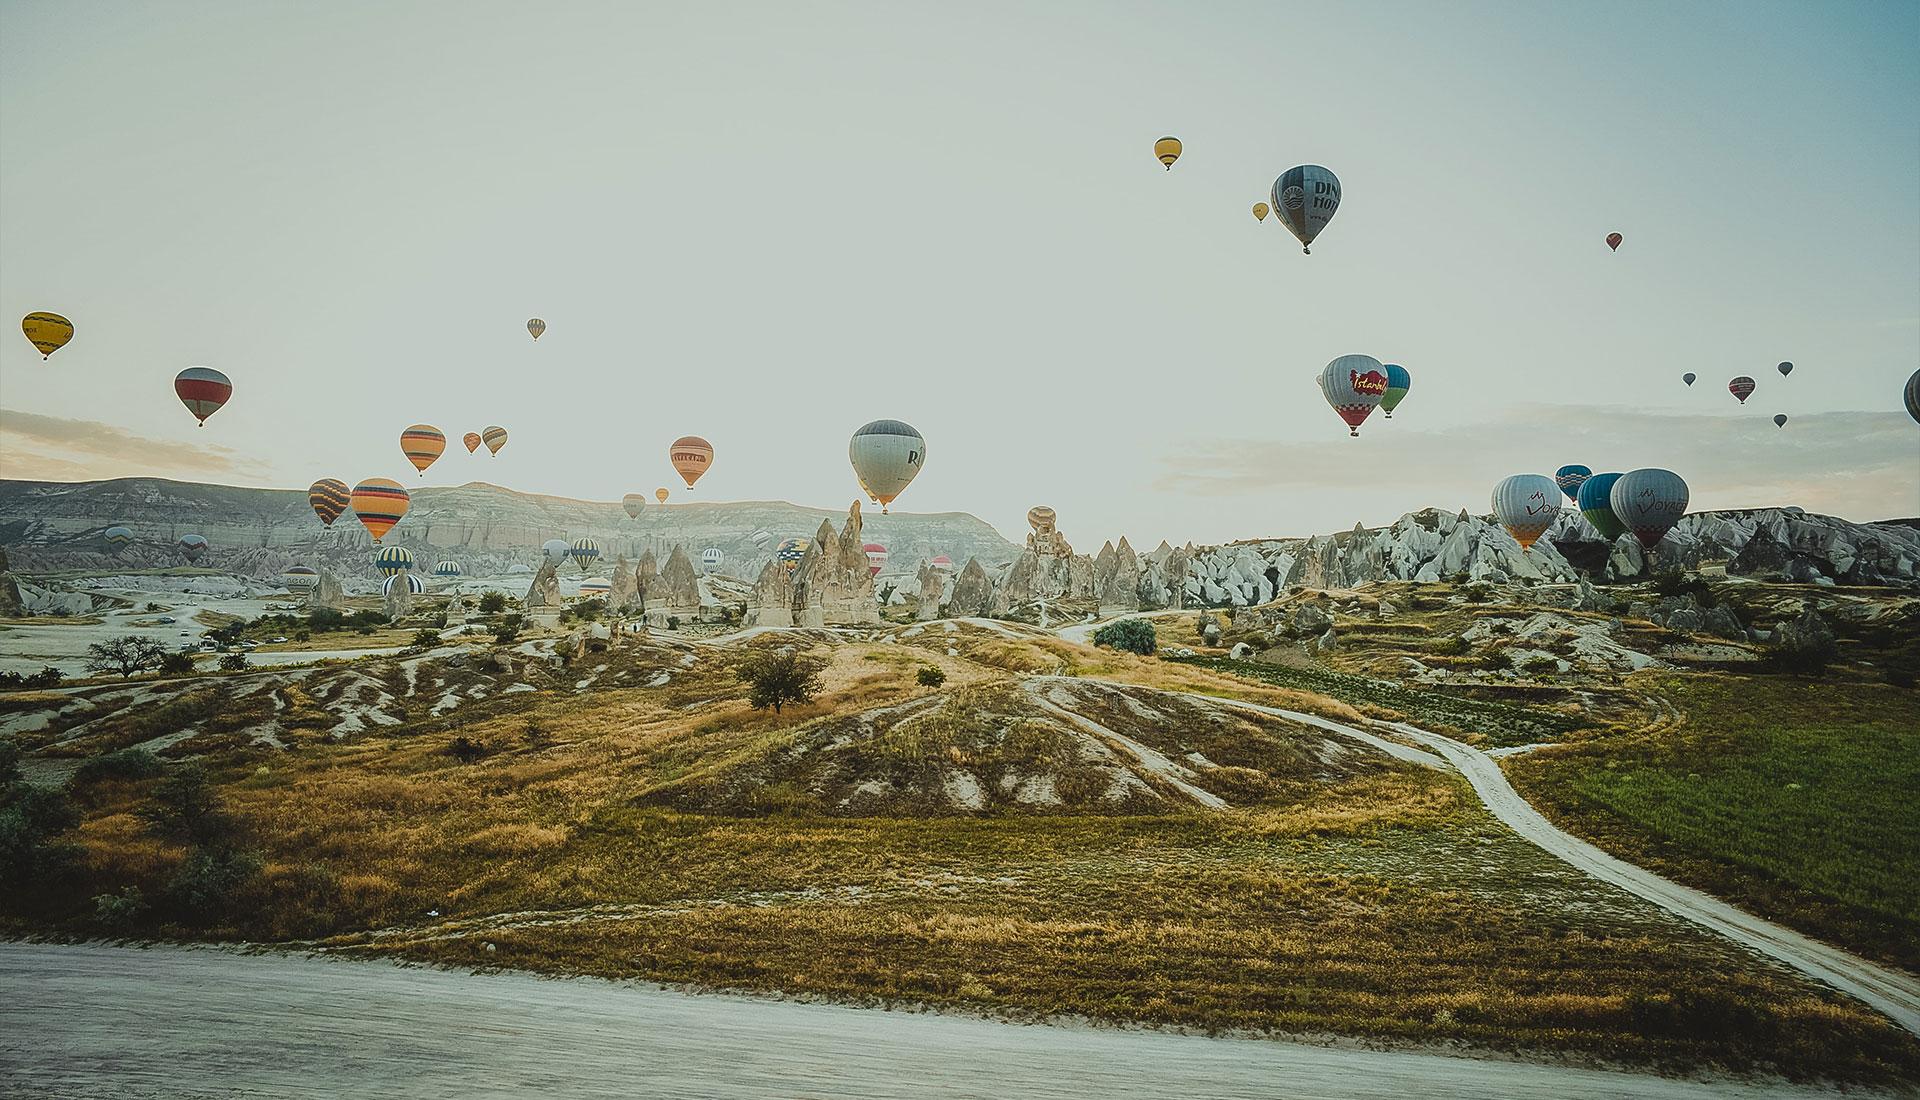 Cappadocia Hot Air Balloon Flight - Rozana Tours Luxury holiday package